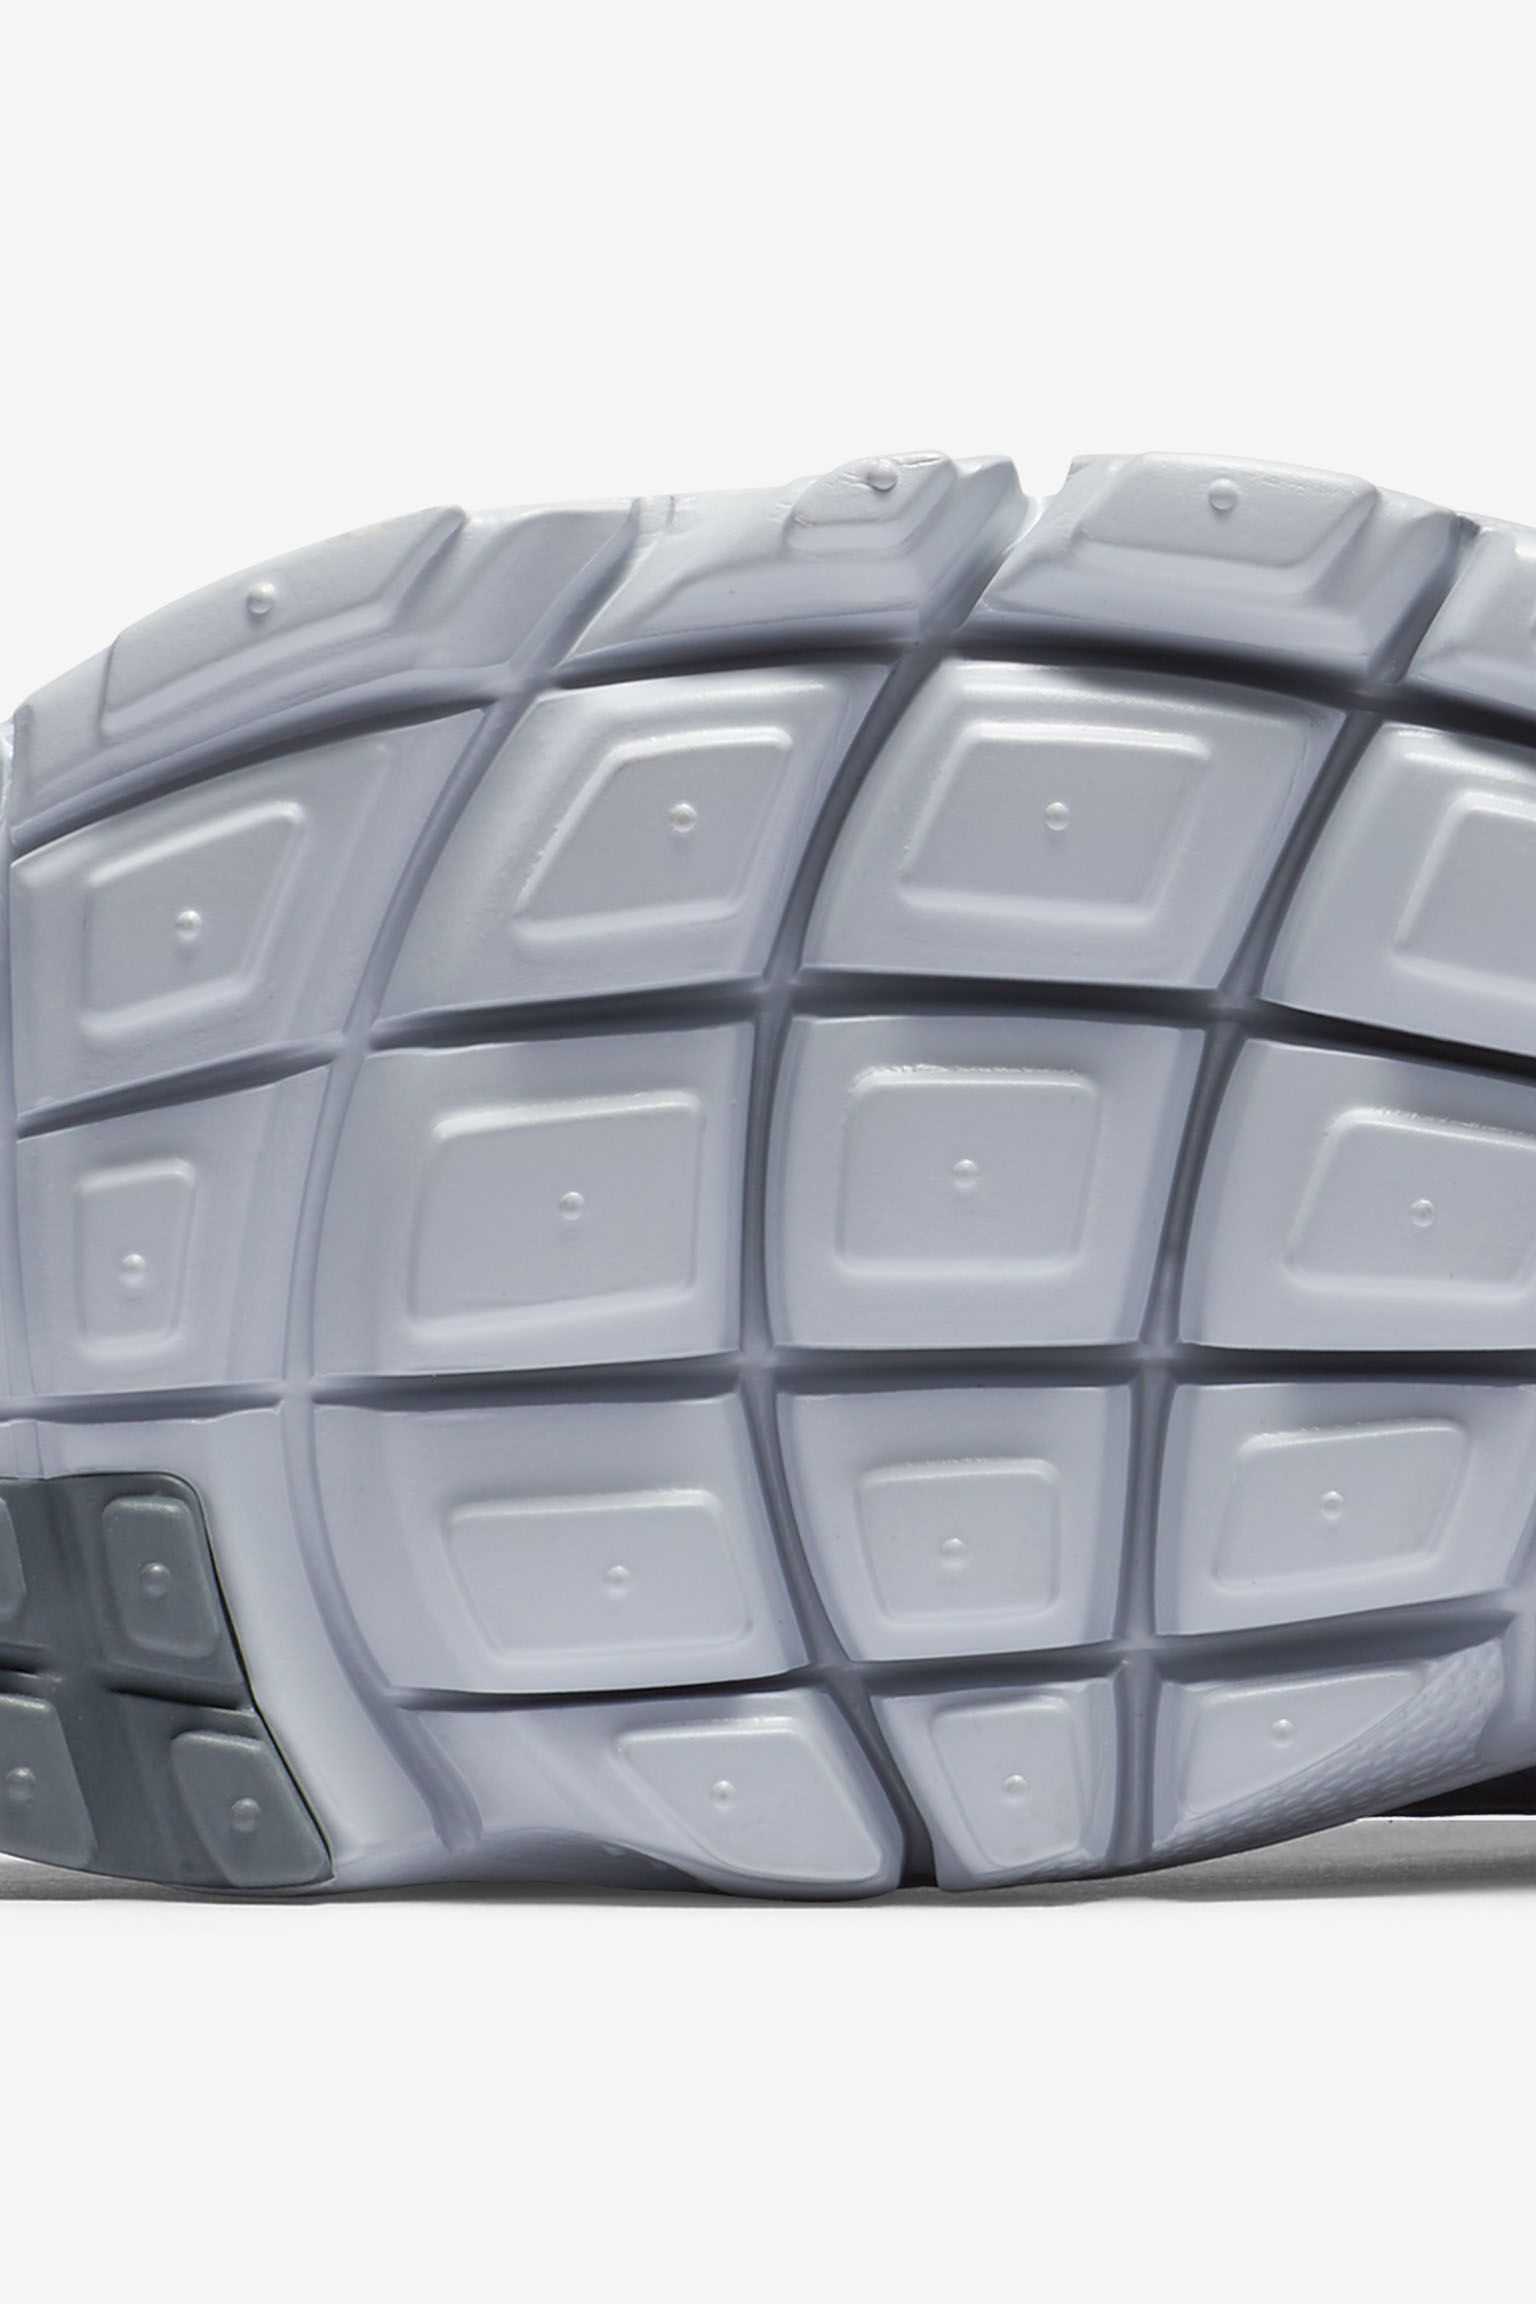 Nike Air Footscape 'Sakura' Release Date